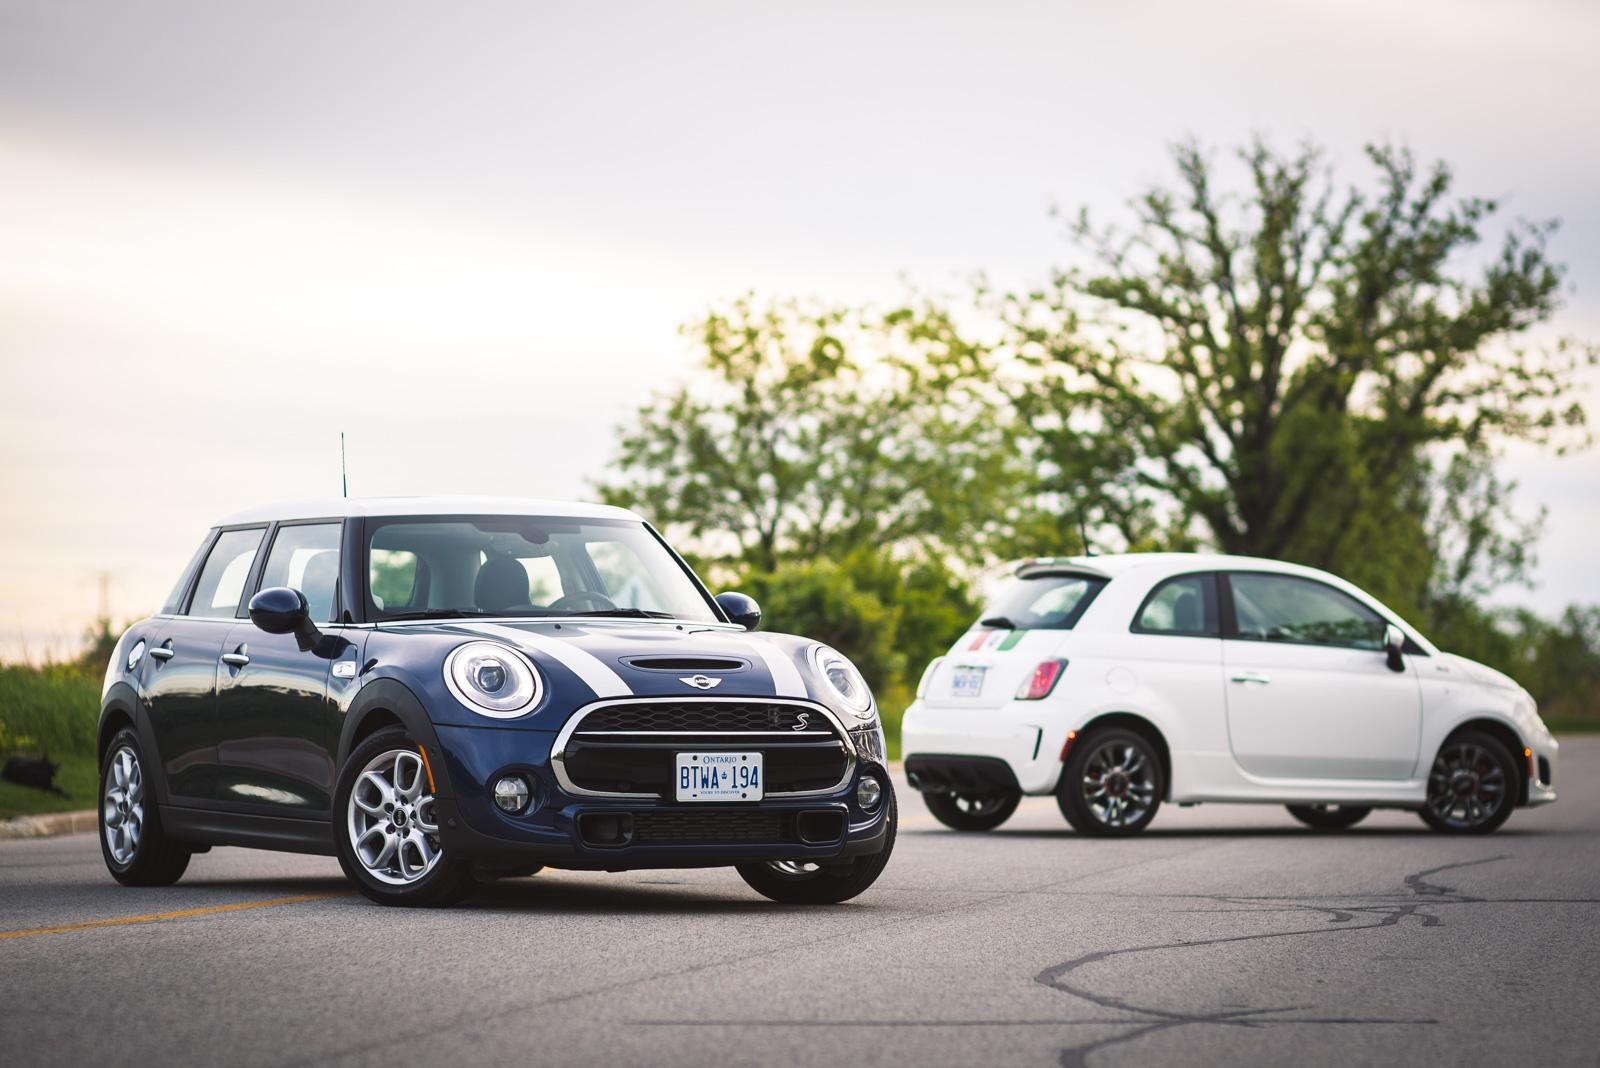 review: 2015 mini cooper s 5-door | canadian auto review